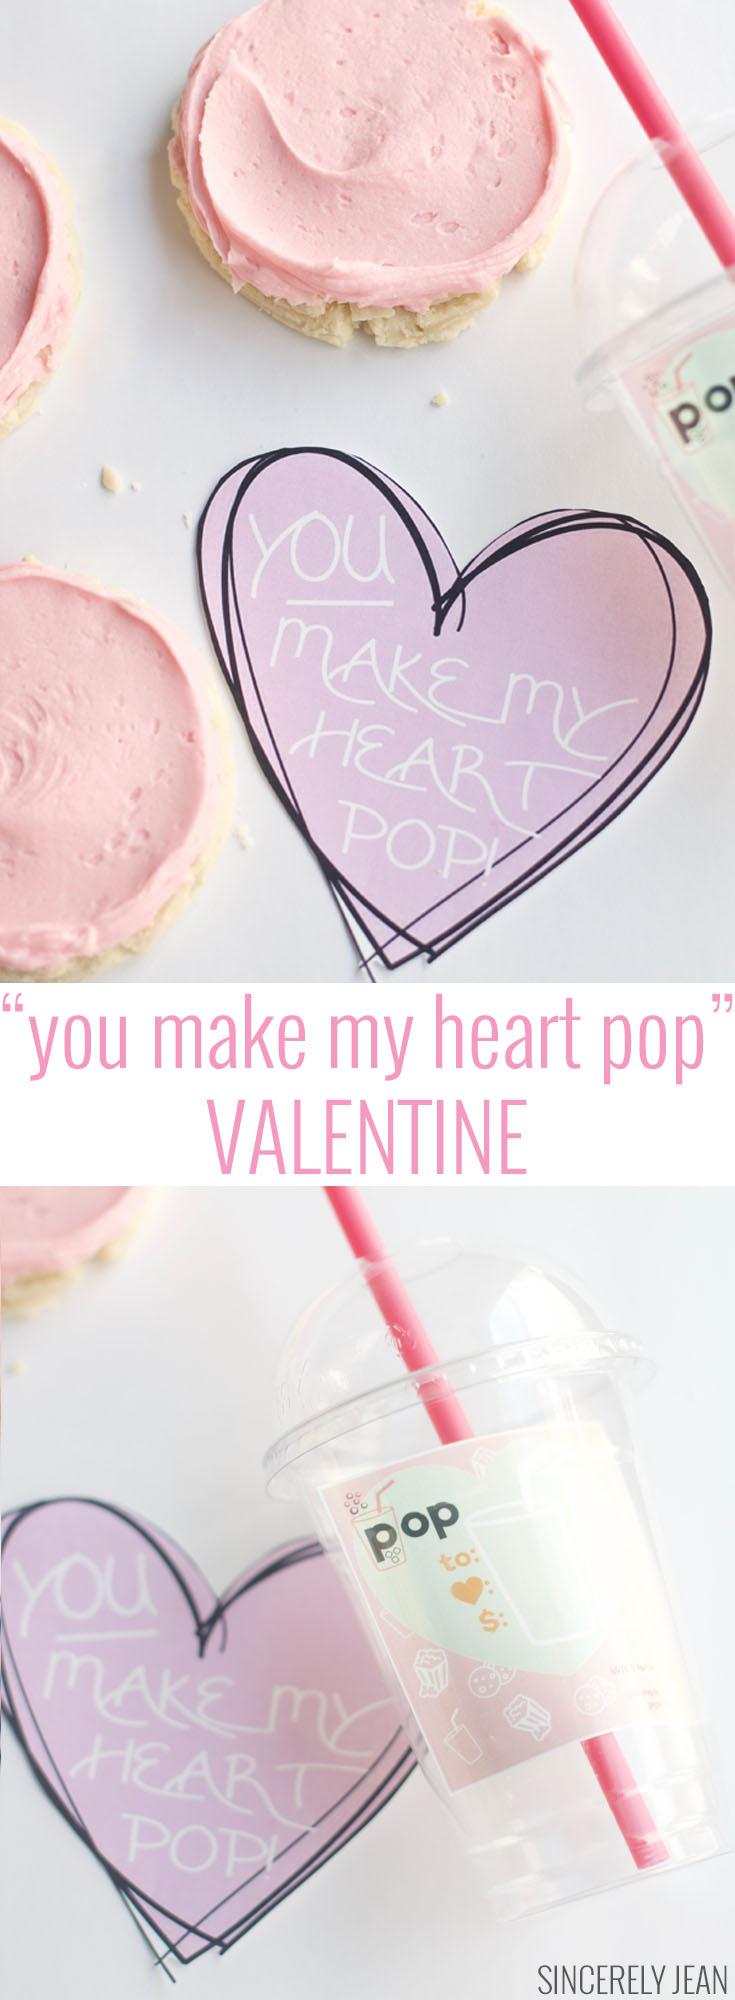 You make my heart pop valentine, Valentines day, free printable, printable, free, soda, swig, cookie, dessert, valentine dessert